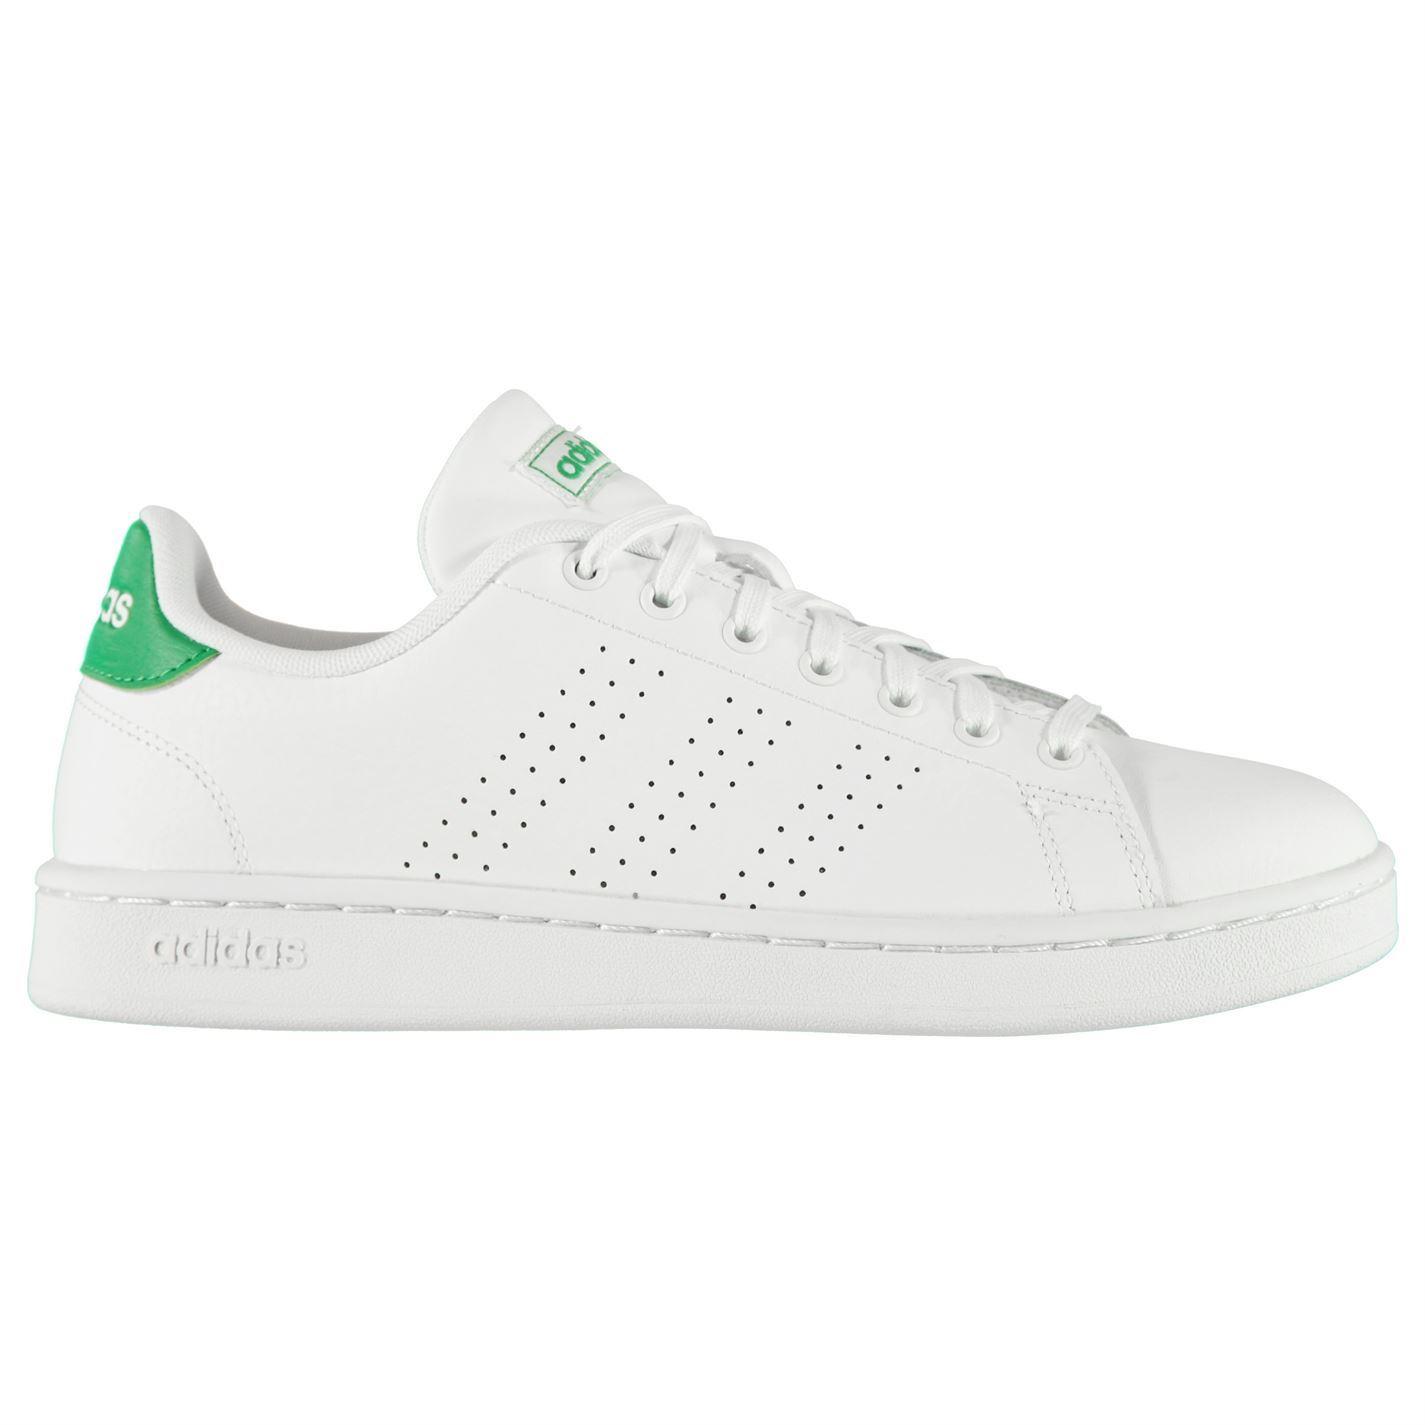 Adidas-Advantage-Baskets-Homme-Chaussures-De-Loisirs-Chaussures-Baskets miniature 6